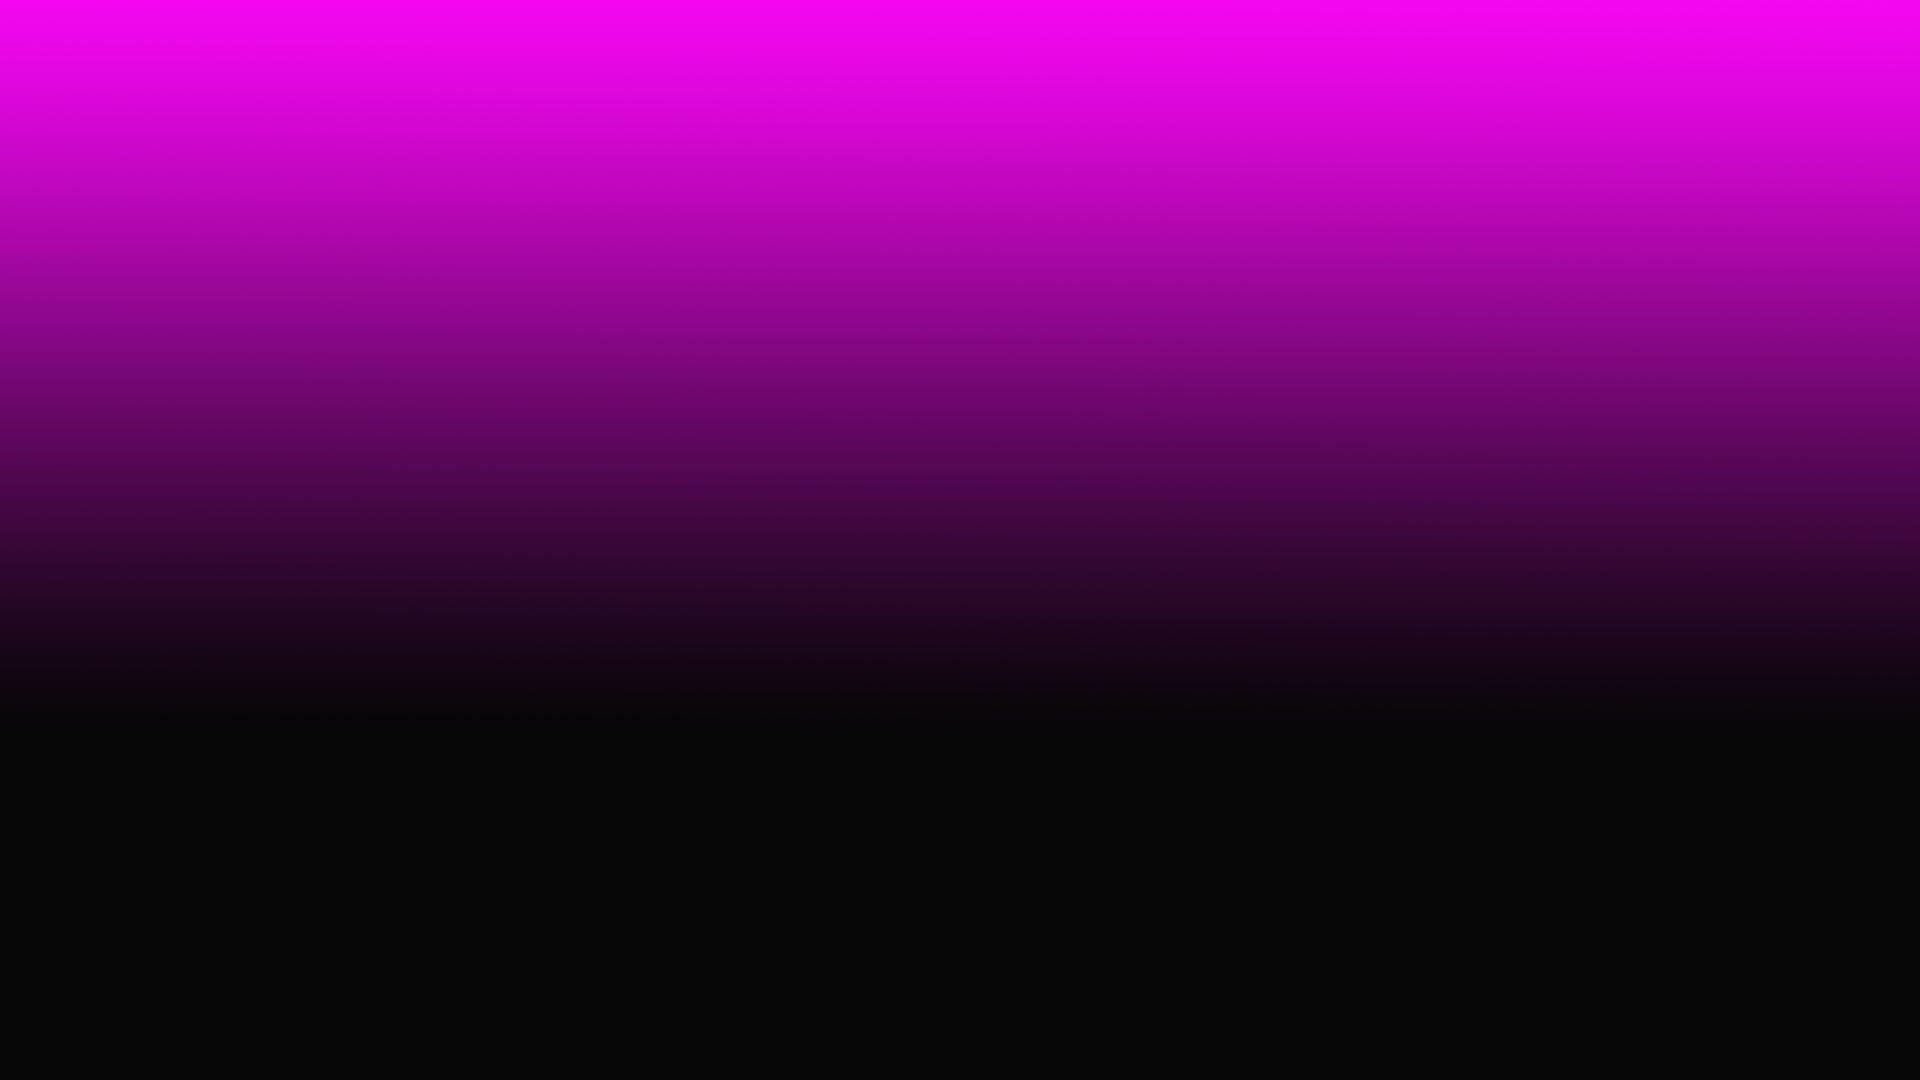 Pink And Black Backgrounds For Desktop - Wallpaper Cave